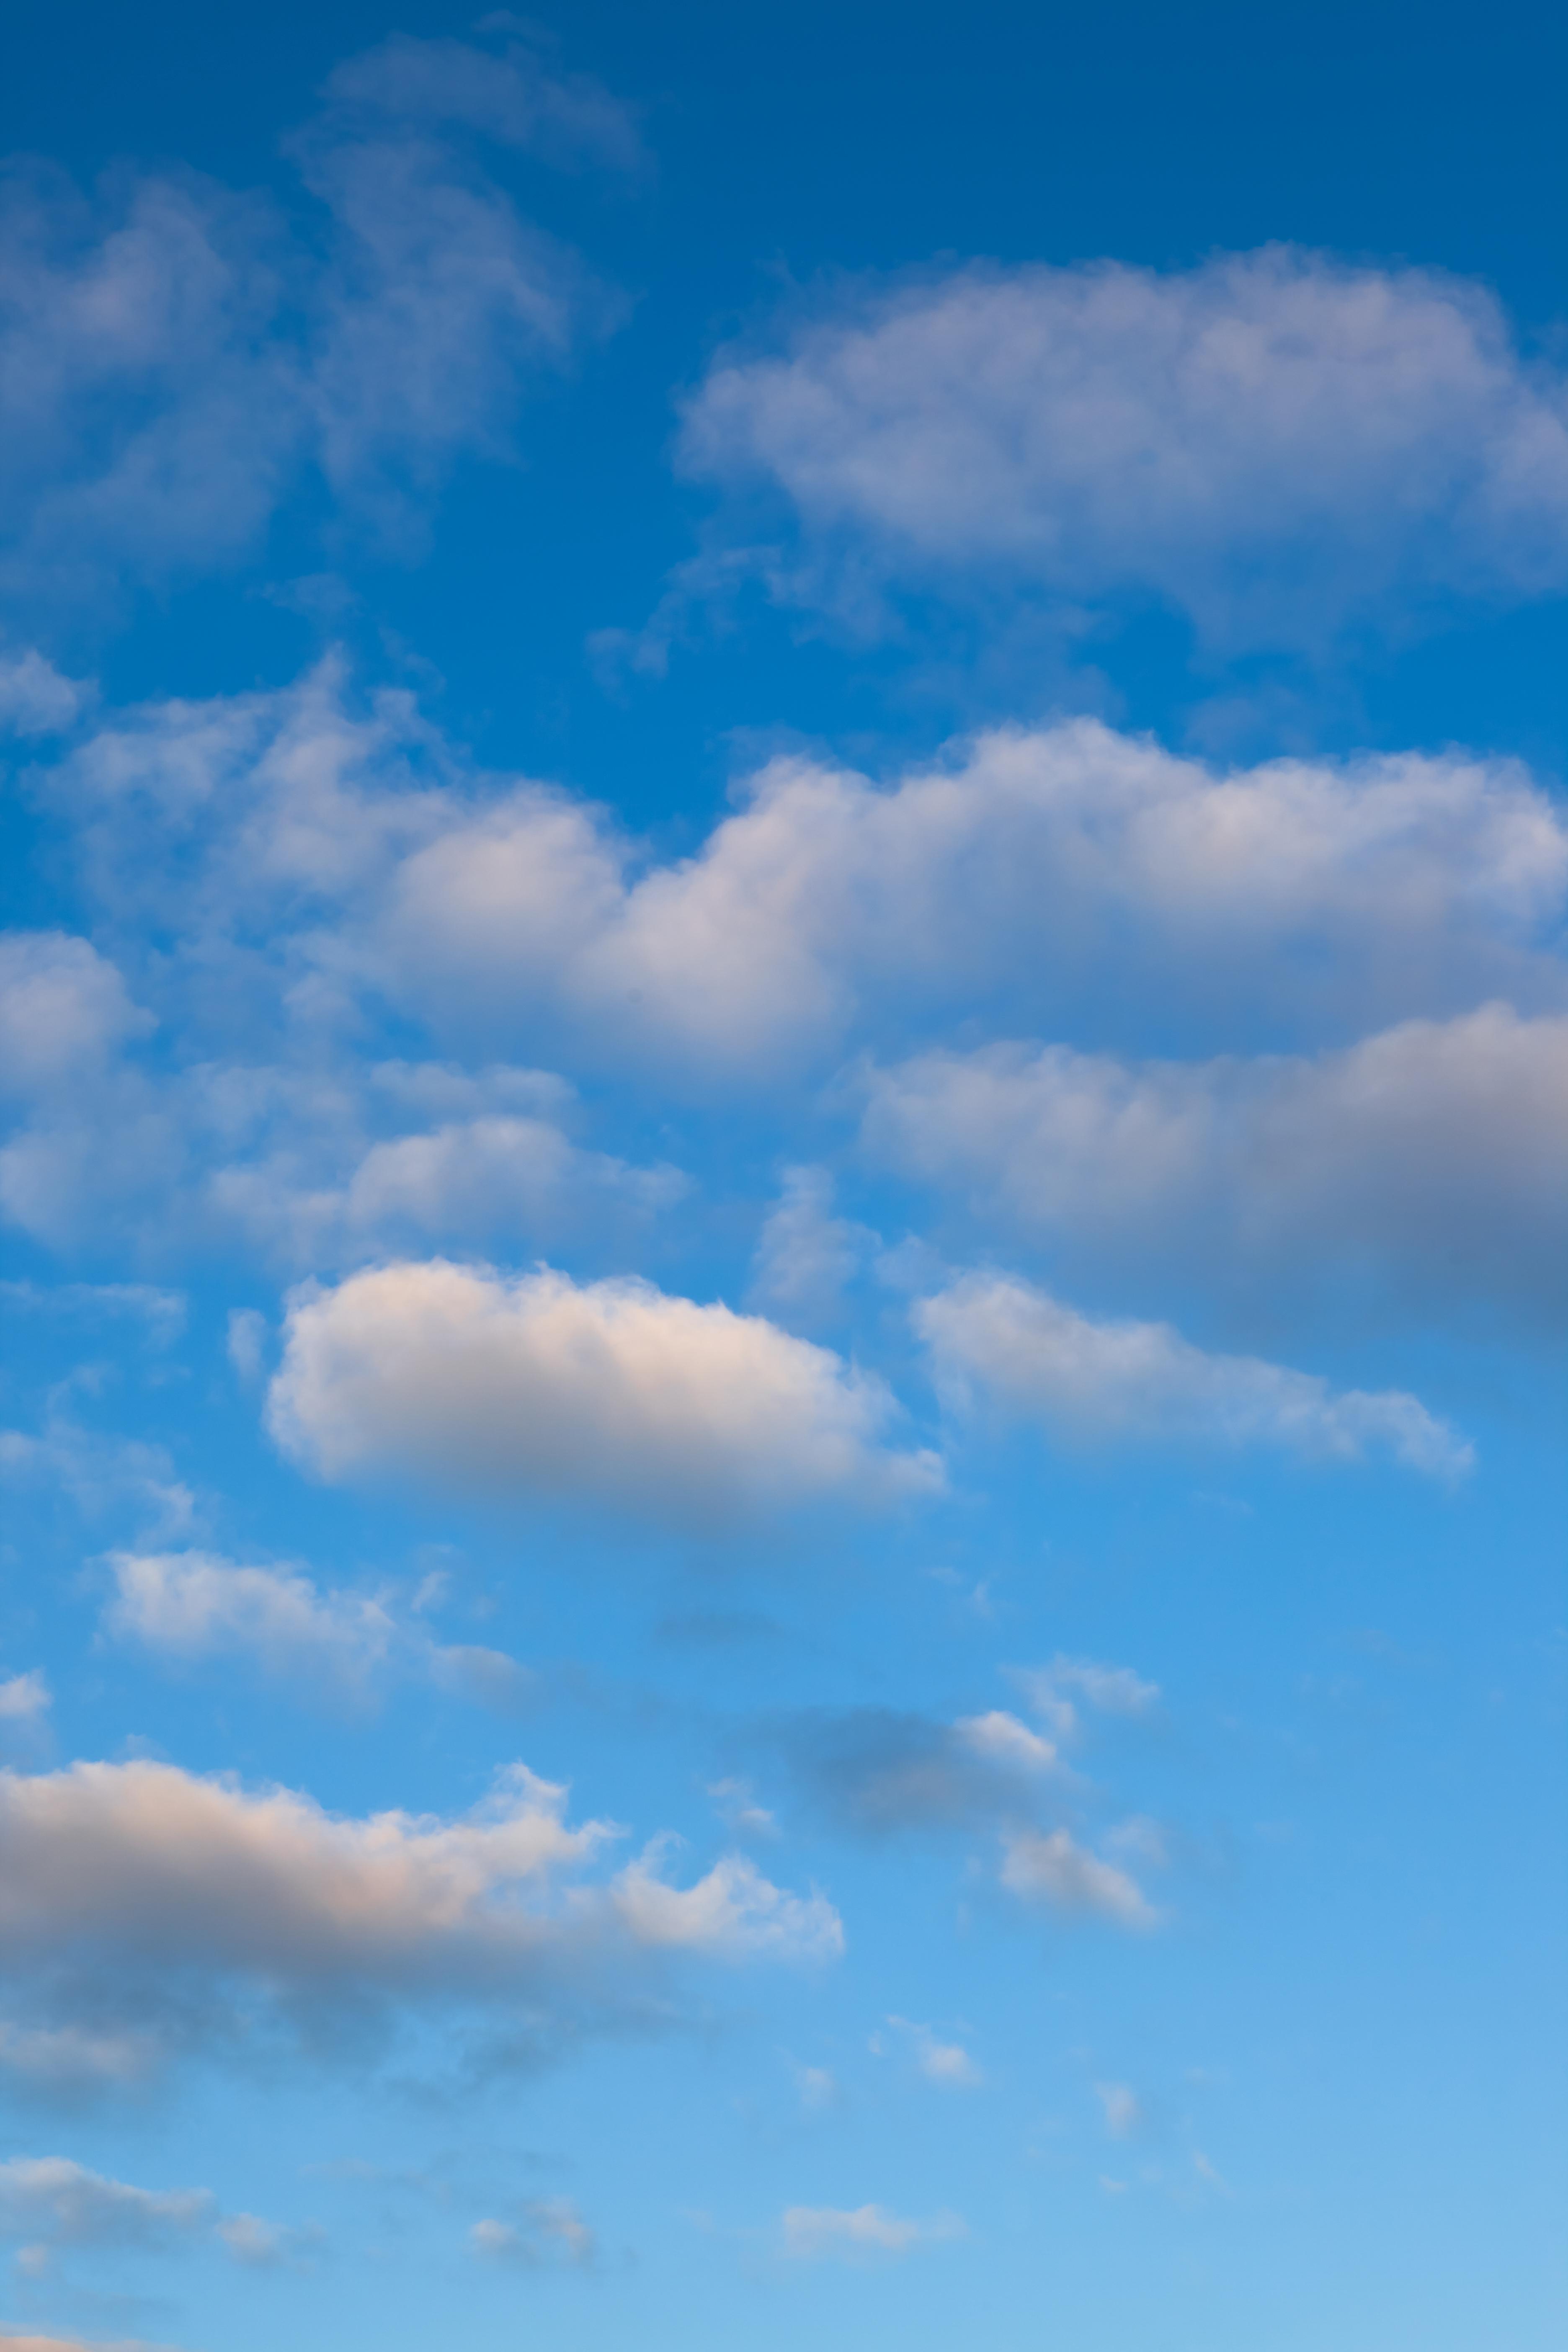 Sky, Air, Peace, Meteorology, Moisture, HQ Photo